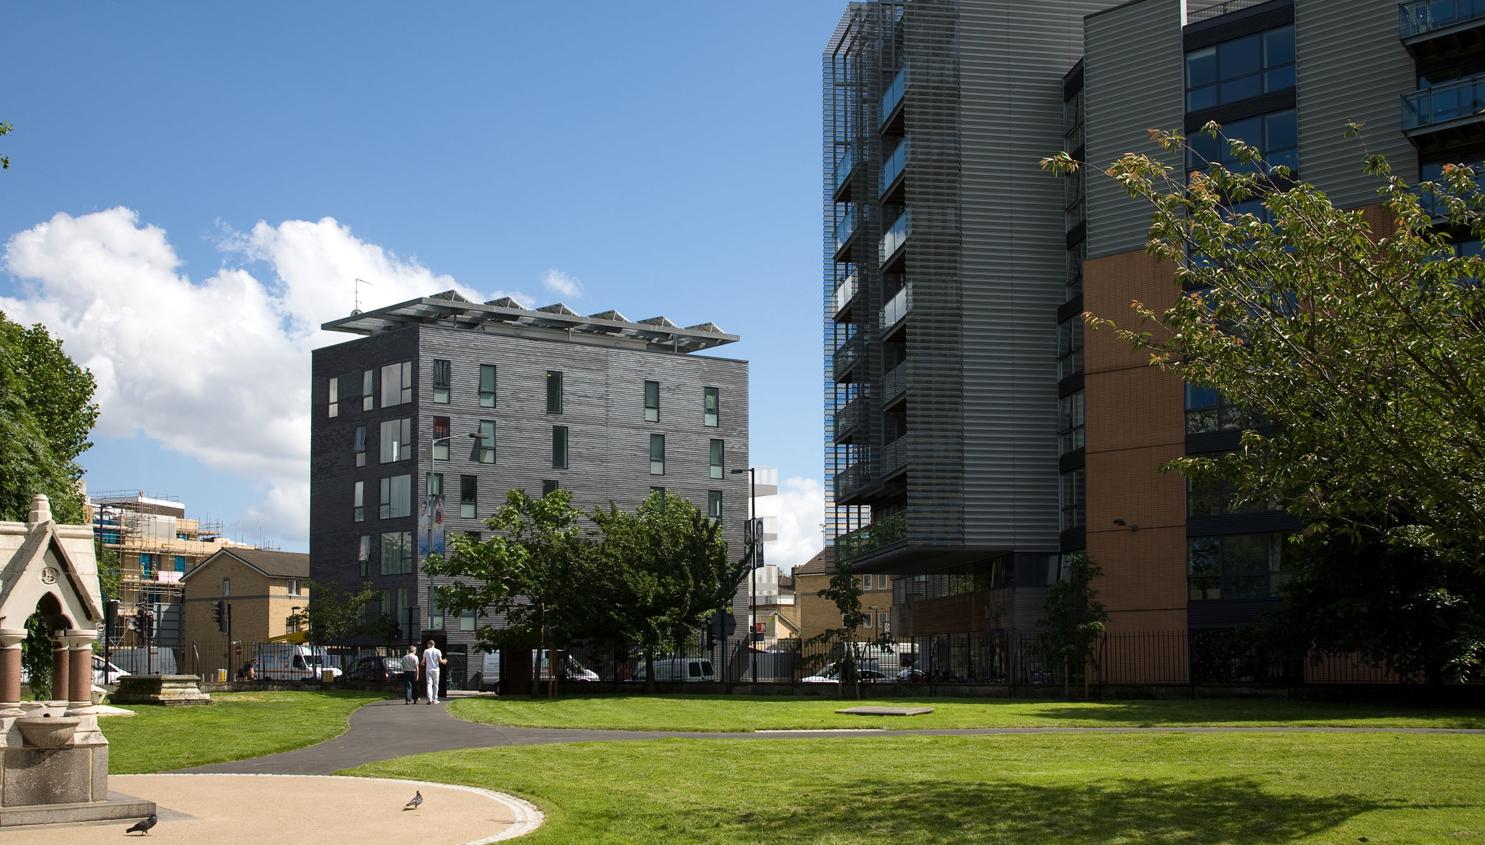 Photograph of Housing Development for Igloo Regeneration and Hexagon Housing in Bermondsey